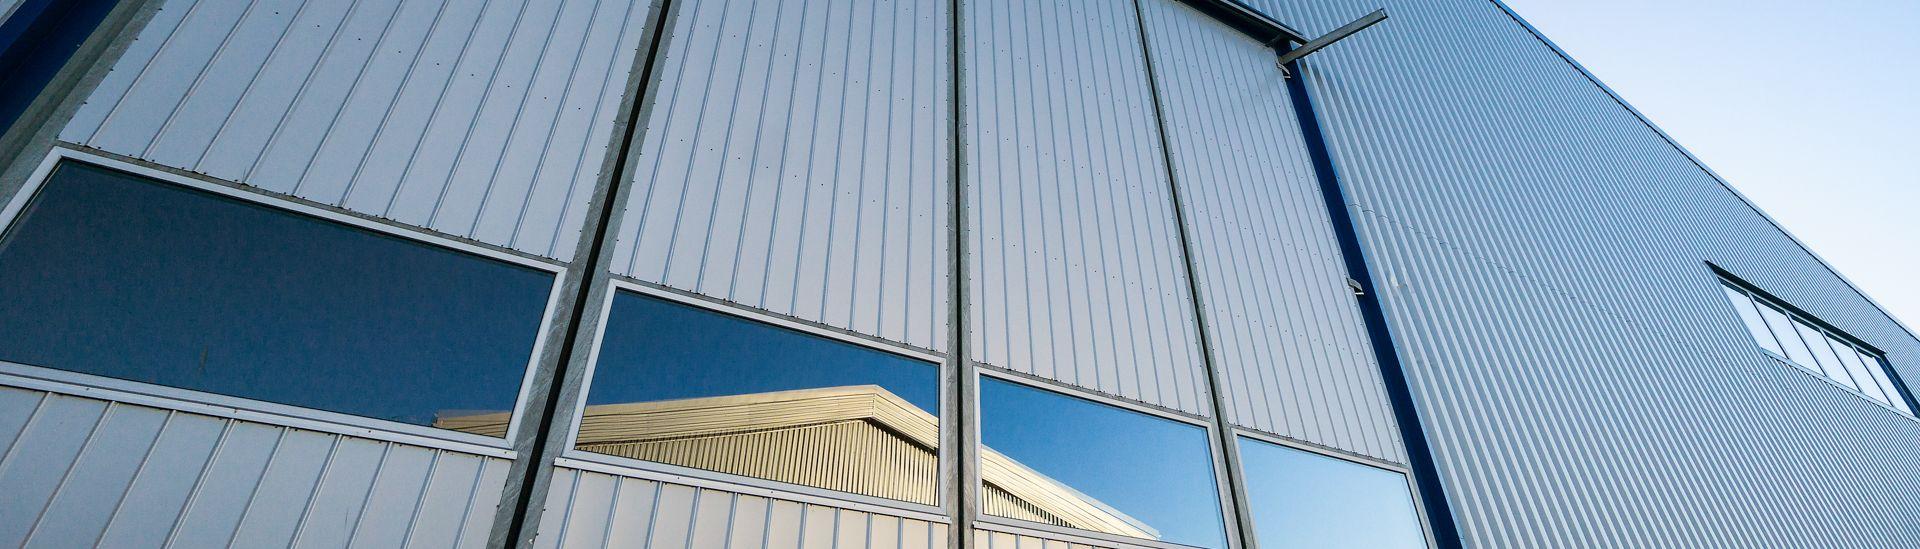 Vrata montované ocelové haly LLENTAB v Kungshamnu